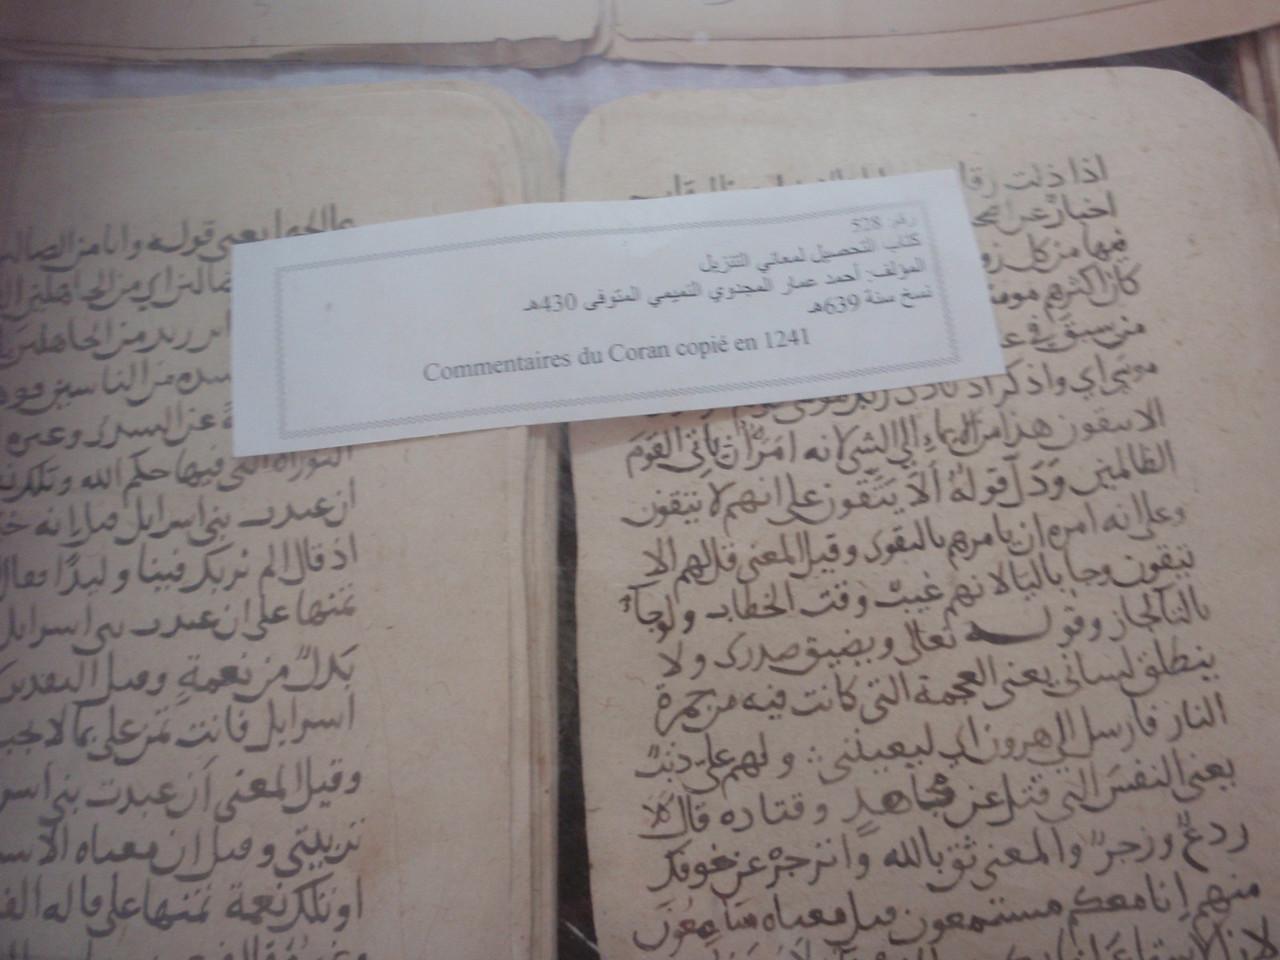 104_Timbuktu Manuscripts Project  Cooperation Univ  Oslo, Norway